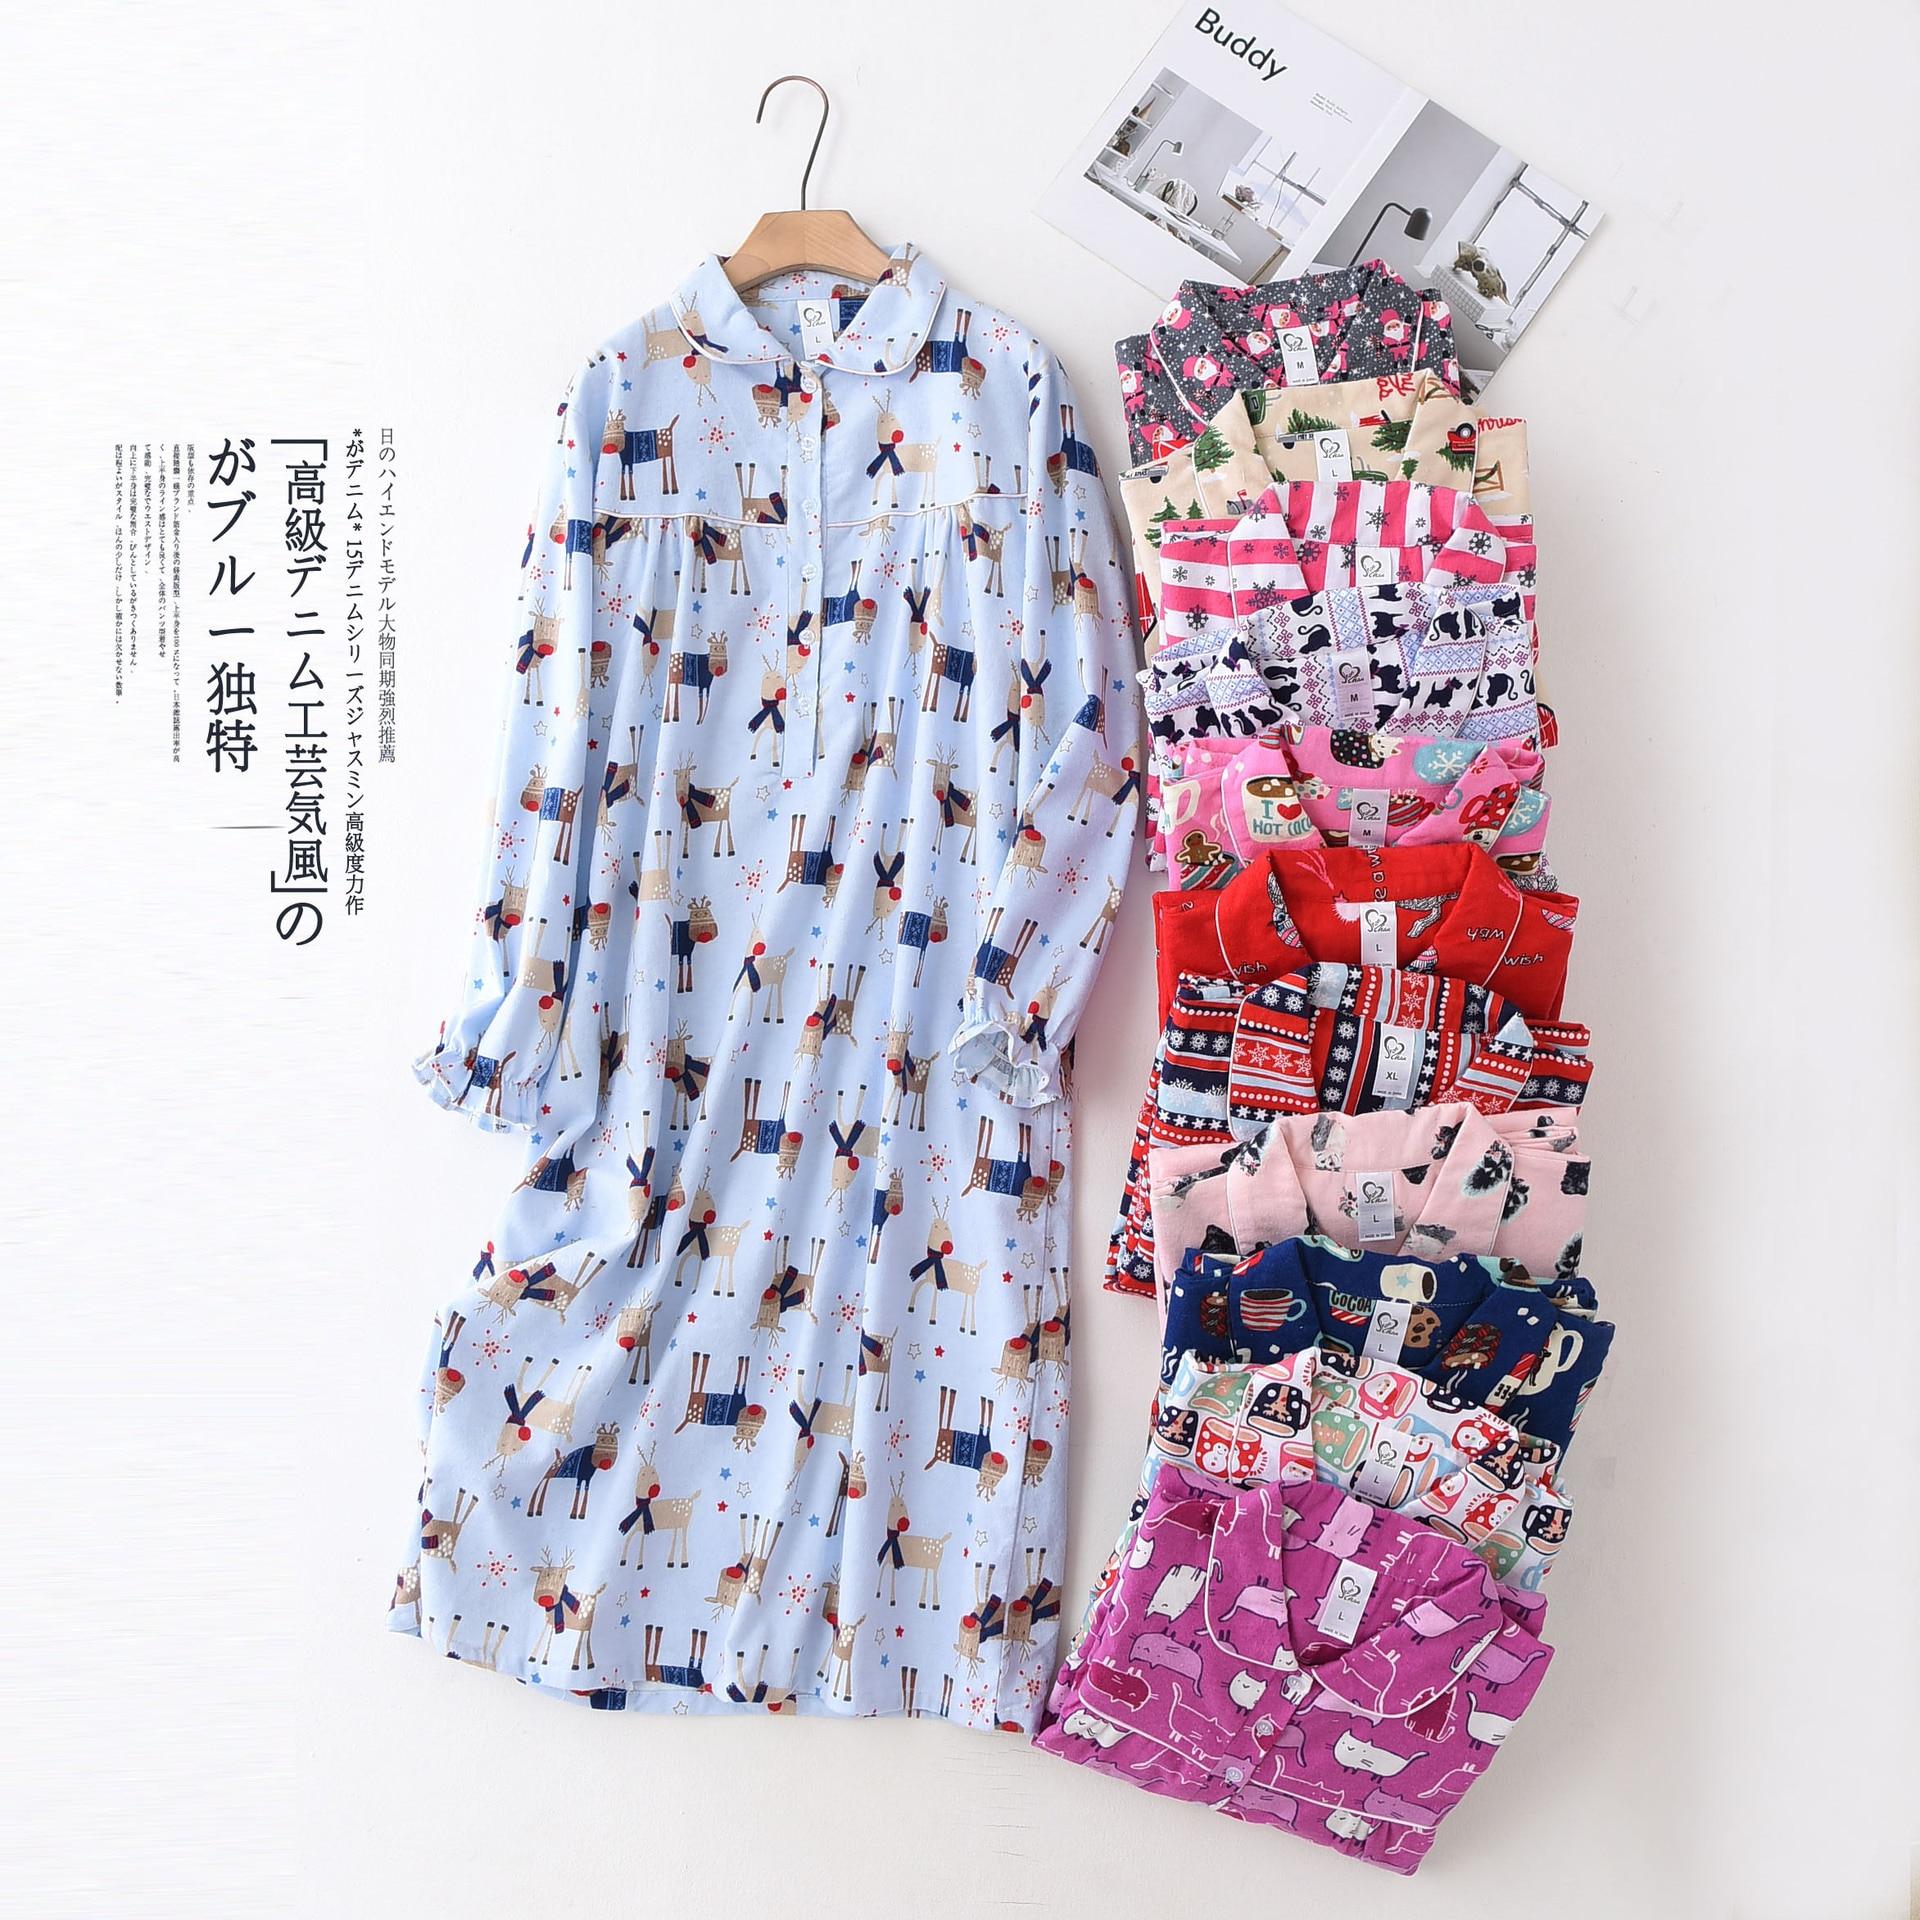 Autumn Cotton Wool Plus Size Women   Nightgowns   Cartoon Long Sleeves Nightdress Womens Sexy Sleepwear Long   Nightgown     Sleepshirts